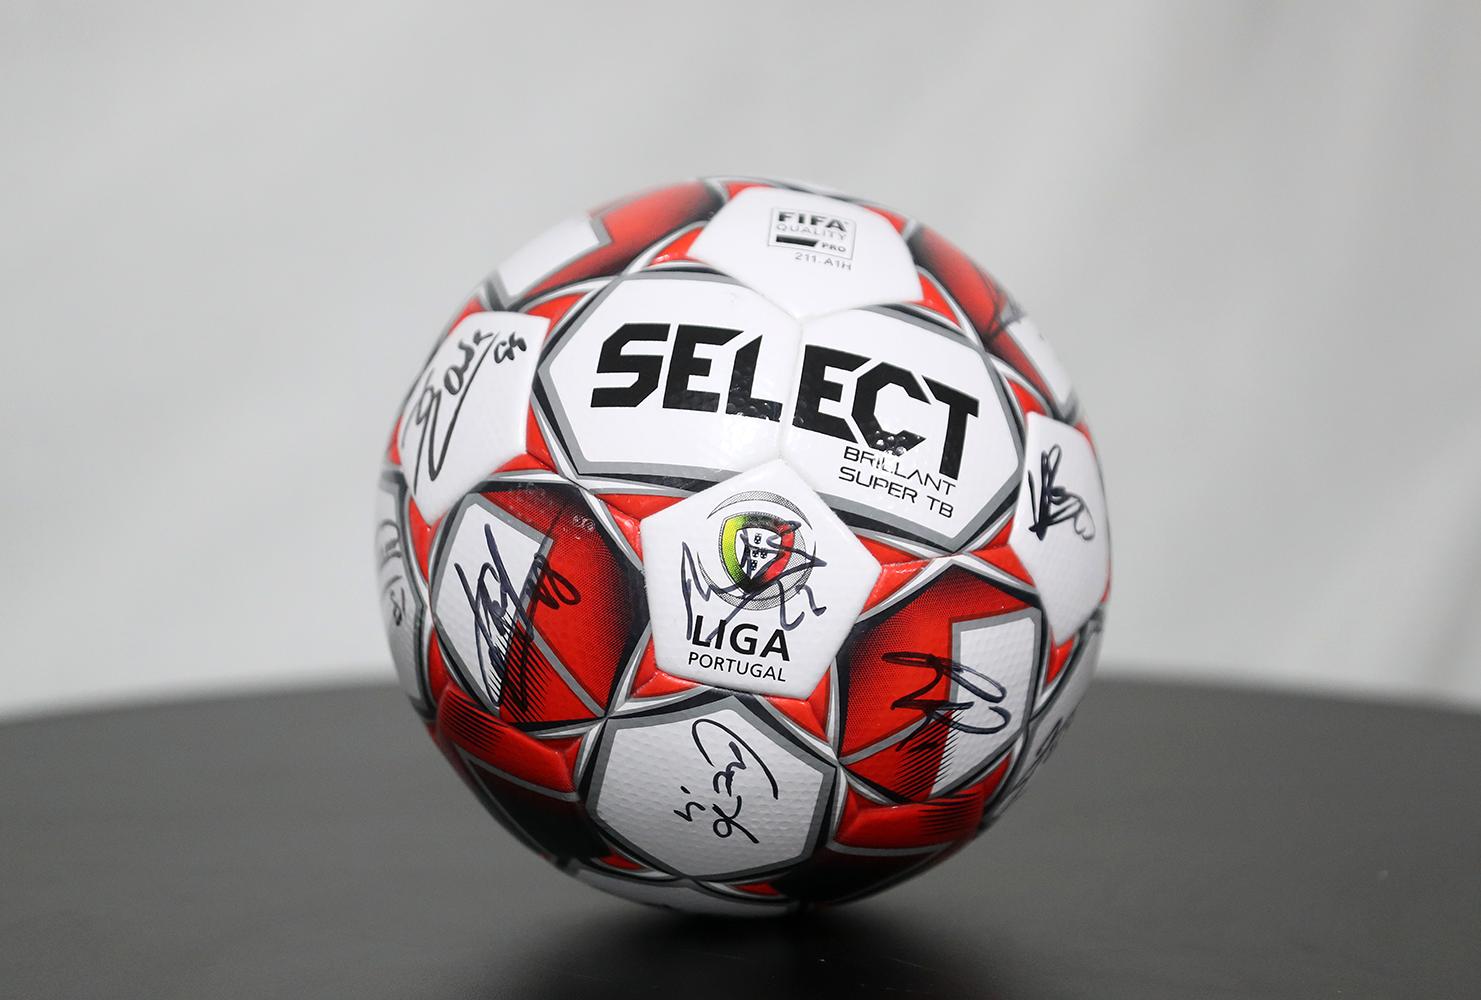 Bola Oficial Select autografada pelo plantel Sporting CP - Final Four Allianz CUP 2020